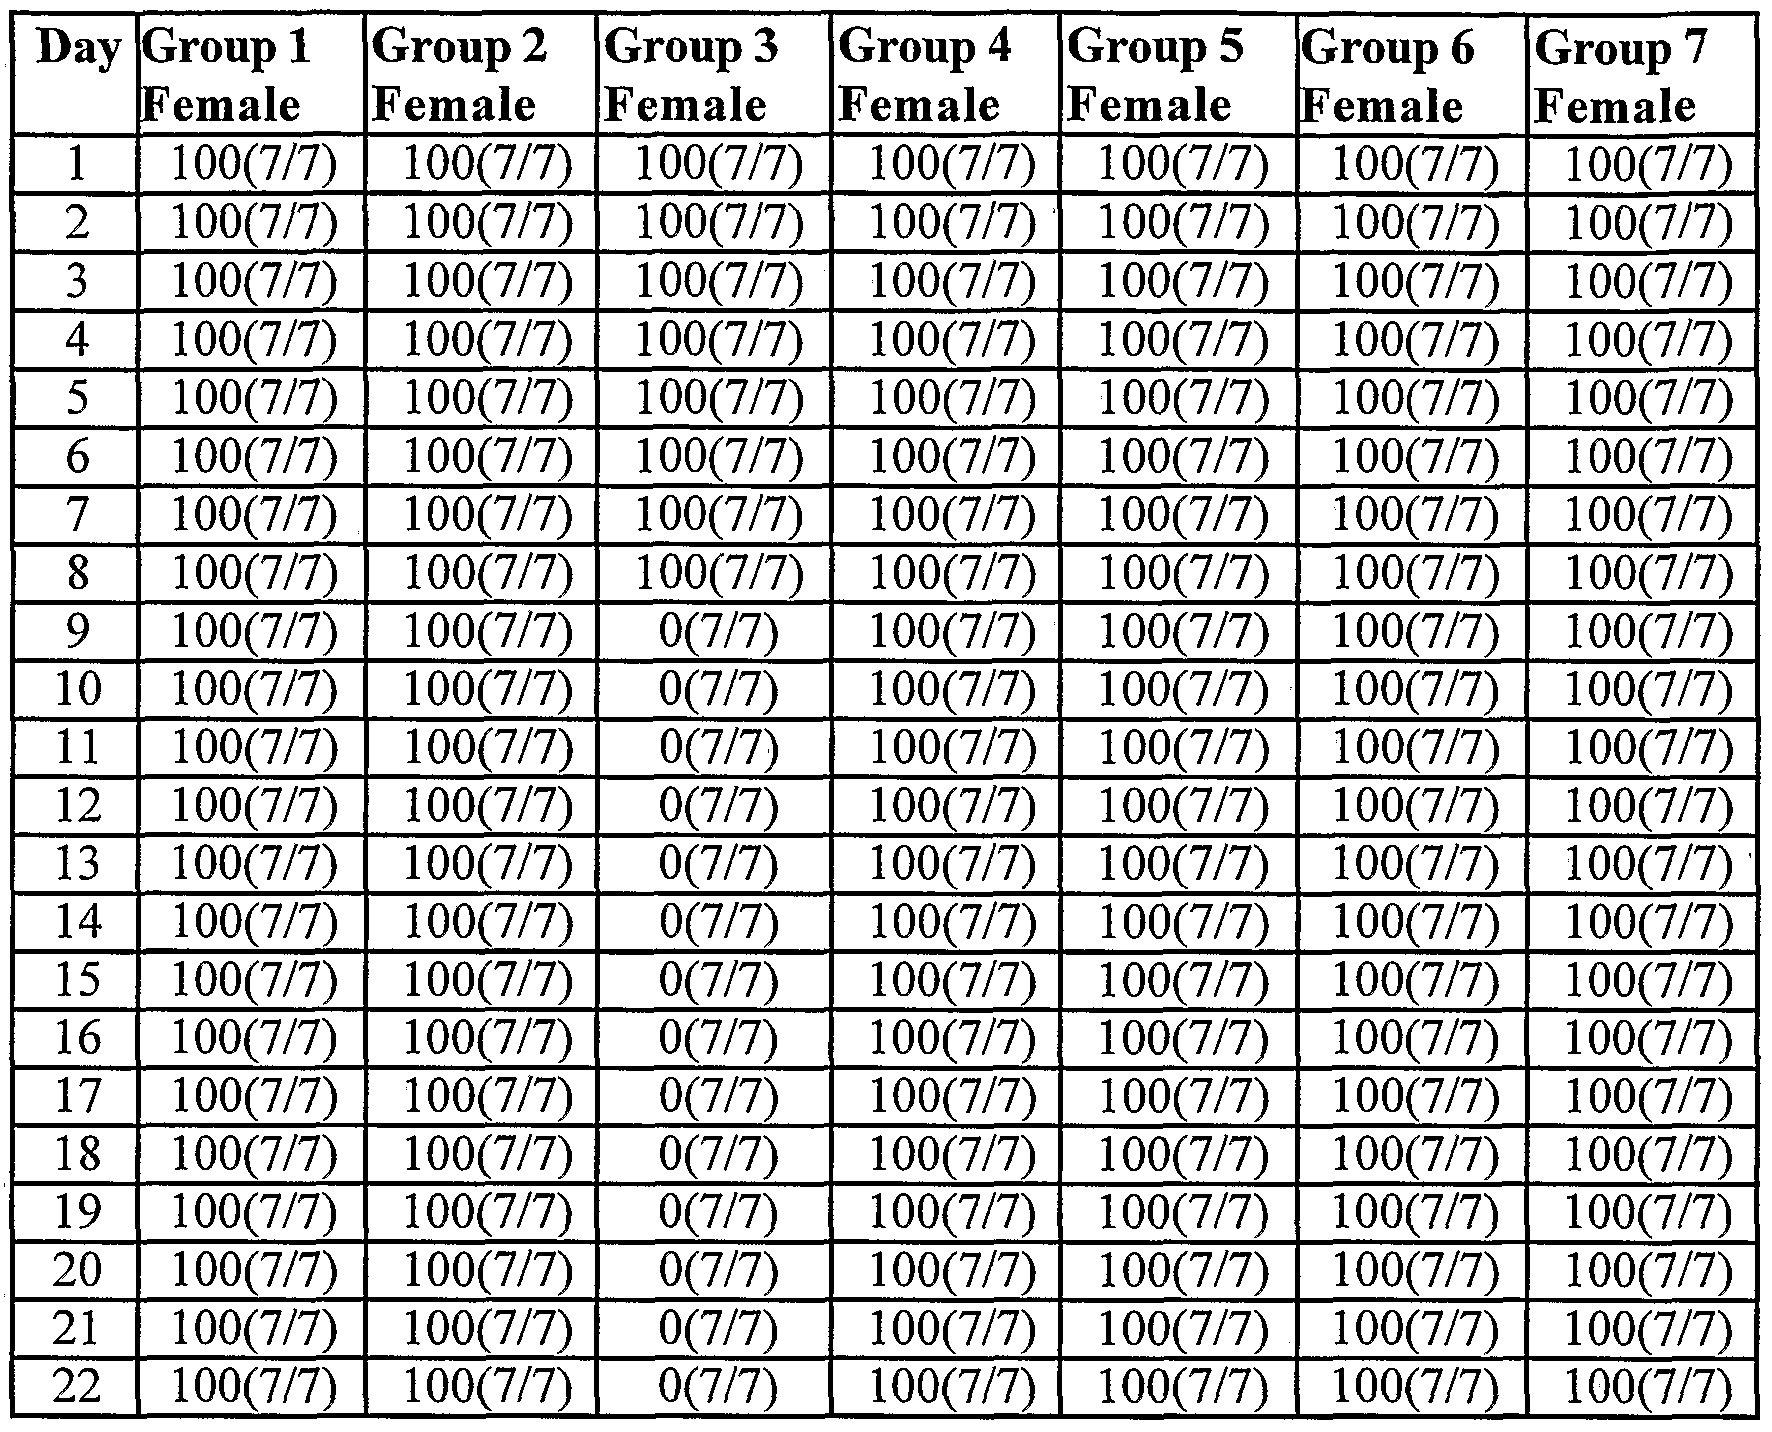 Multi-Dose Vial Expiration Date Calendar :-Free Calendar Free 12 Month Calendar Template For Expiry Dates